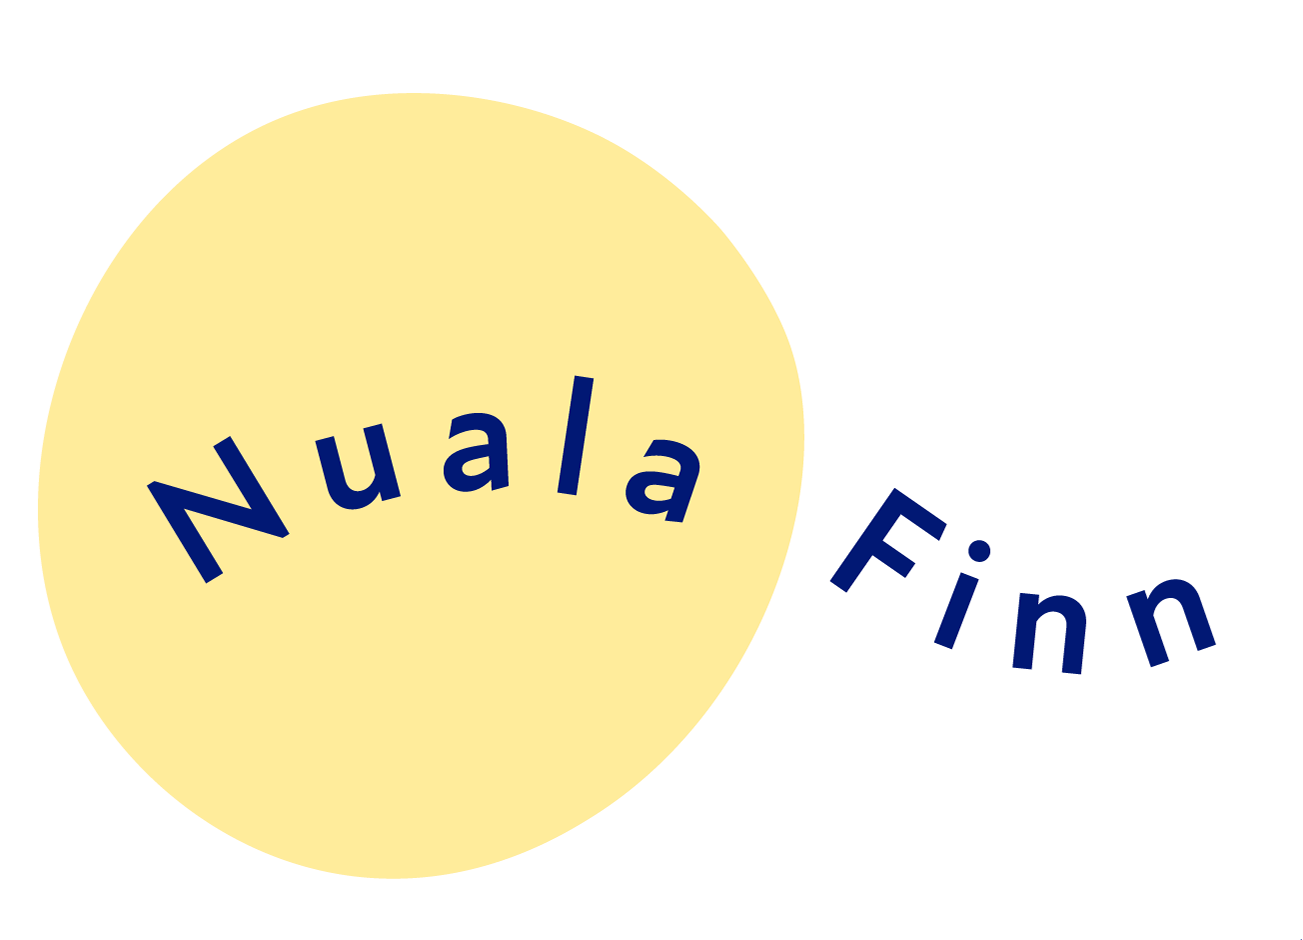 Nuala Finn